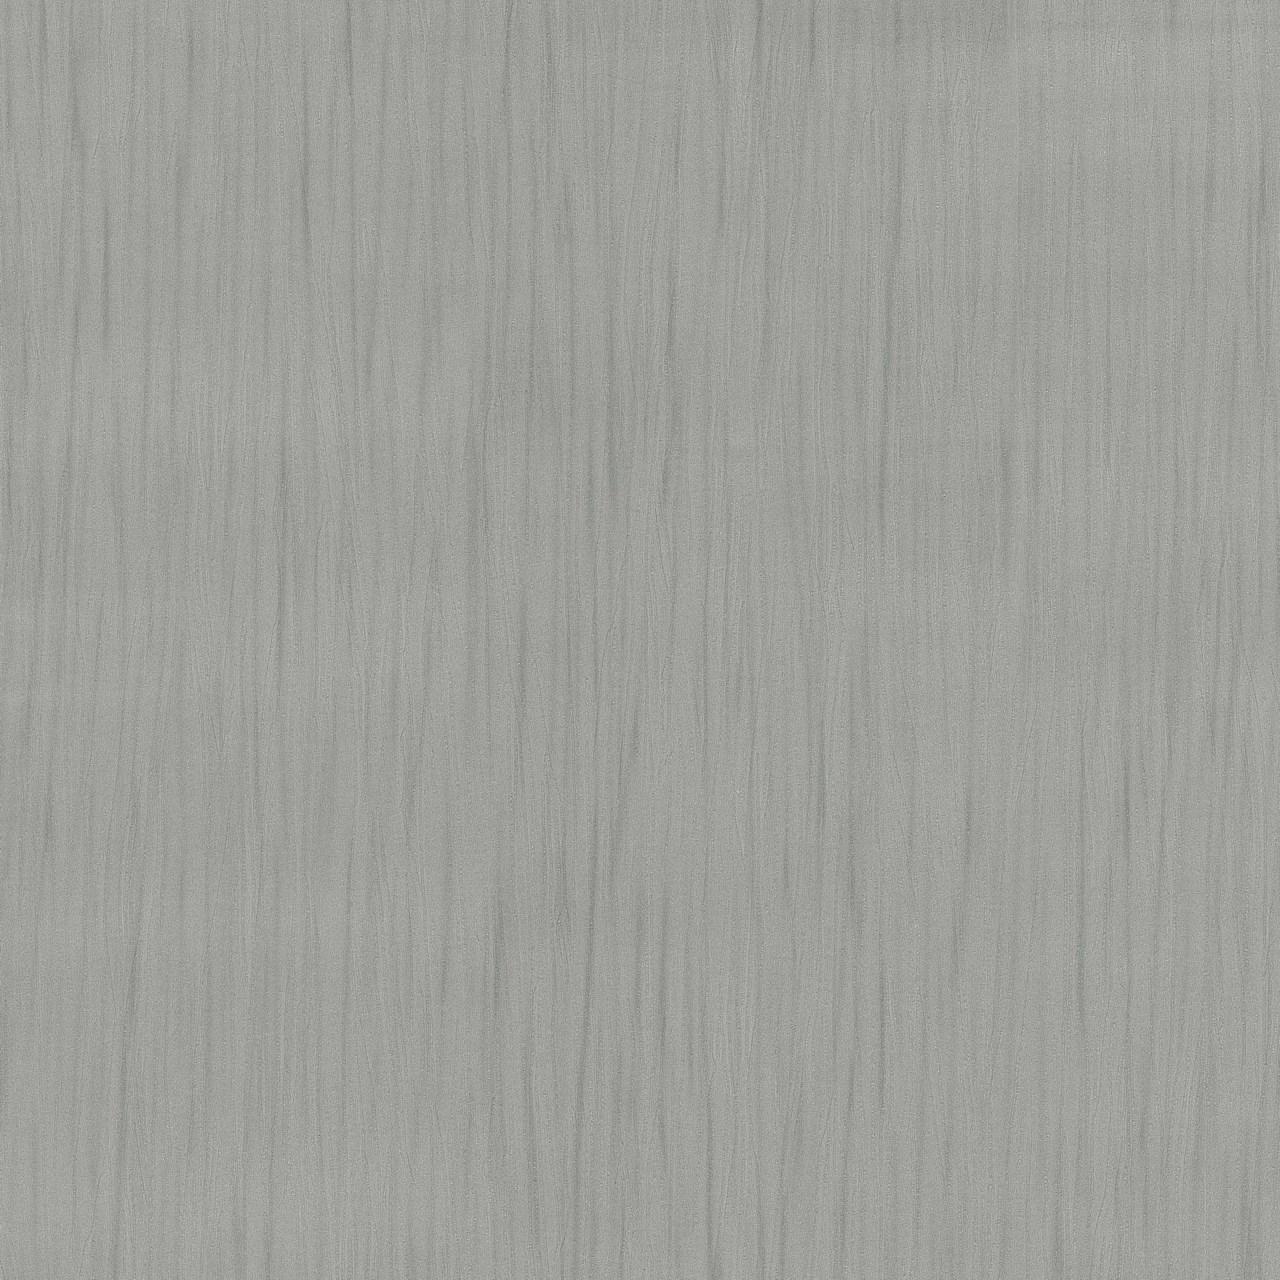 کاغذ دیواری والرین آلبوم هامبر کد 11405